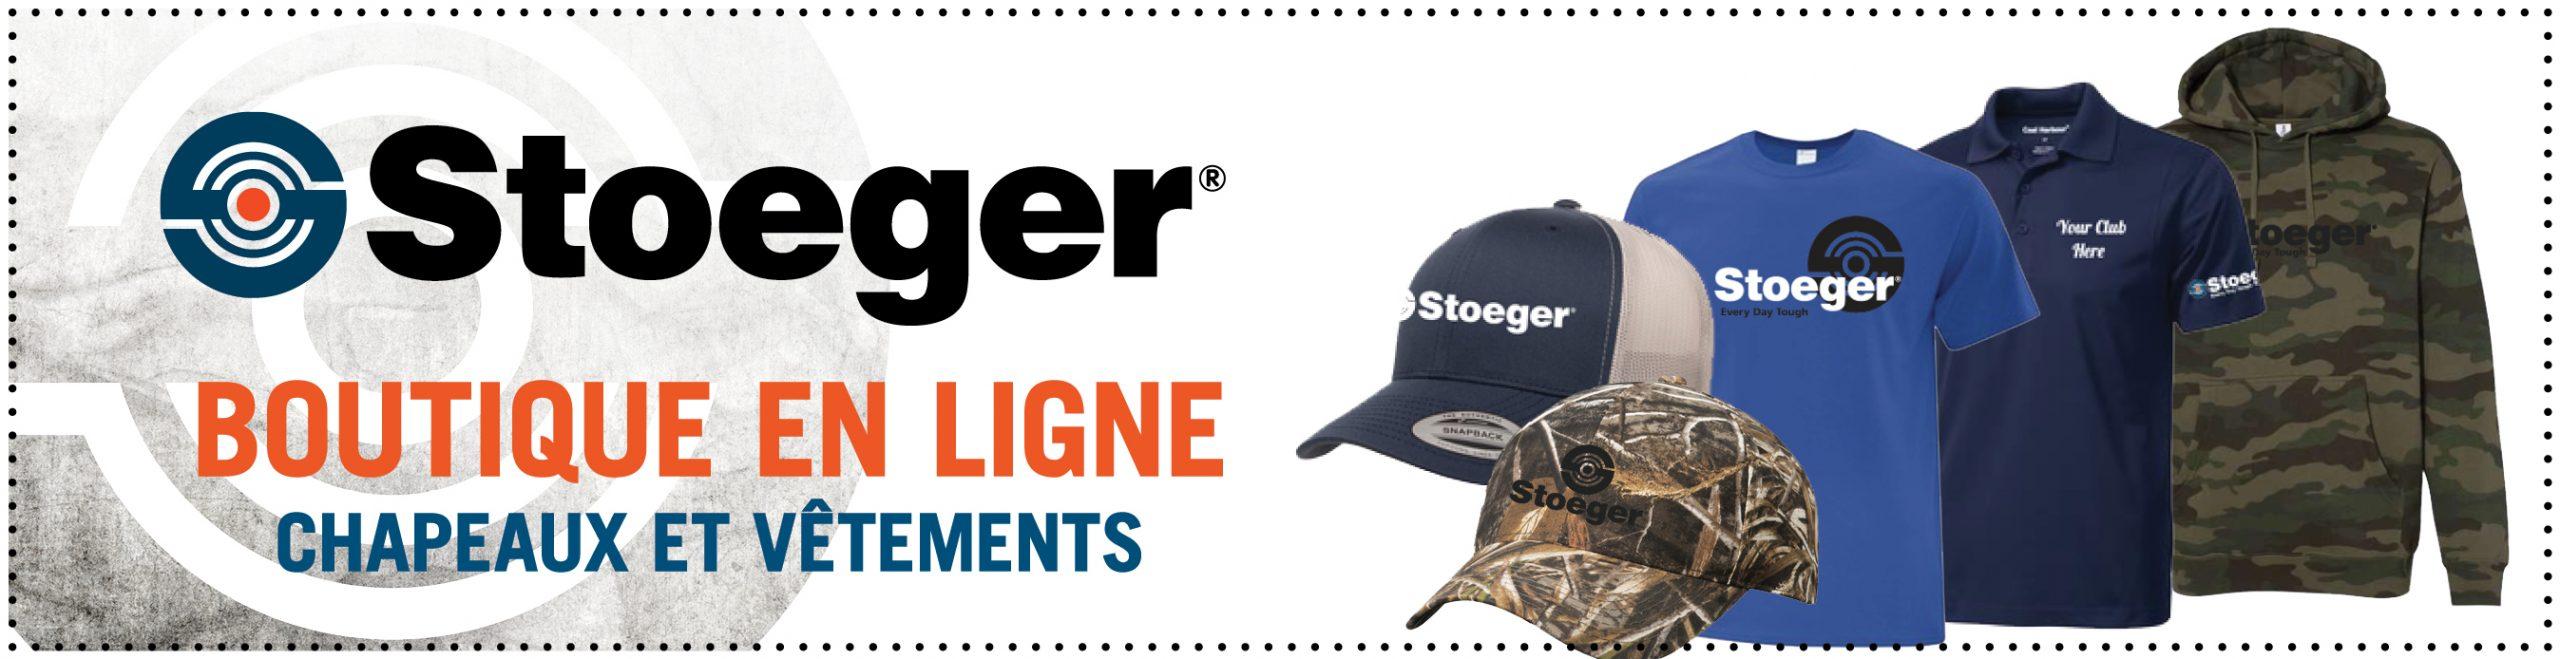 Web Banner Stoeger Clothing 2021 FR 970x250